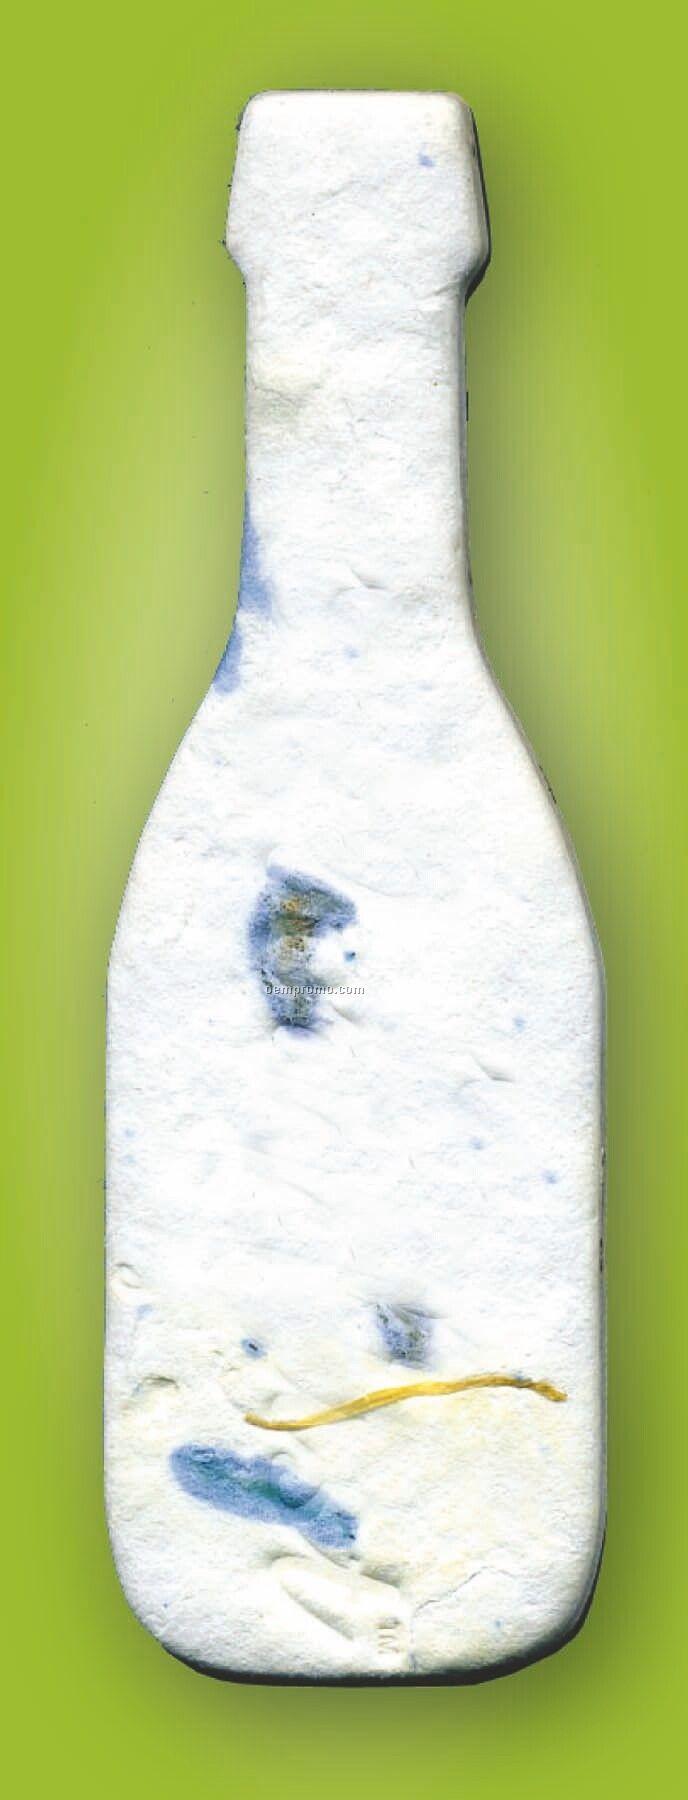 Forget Me Not Bottle Handmade Seed Plantable Mini